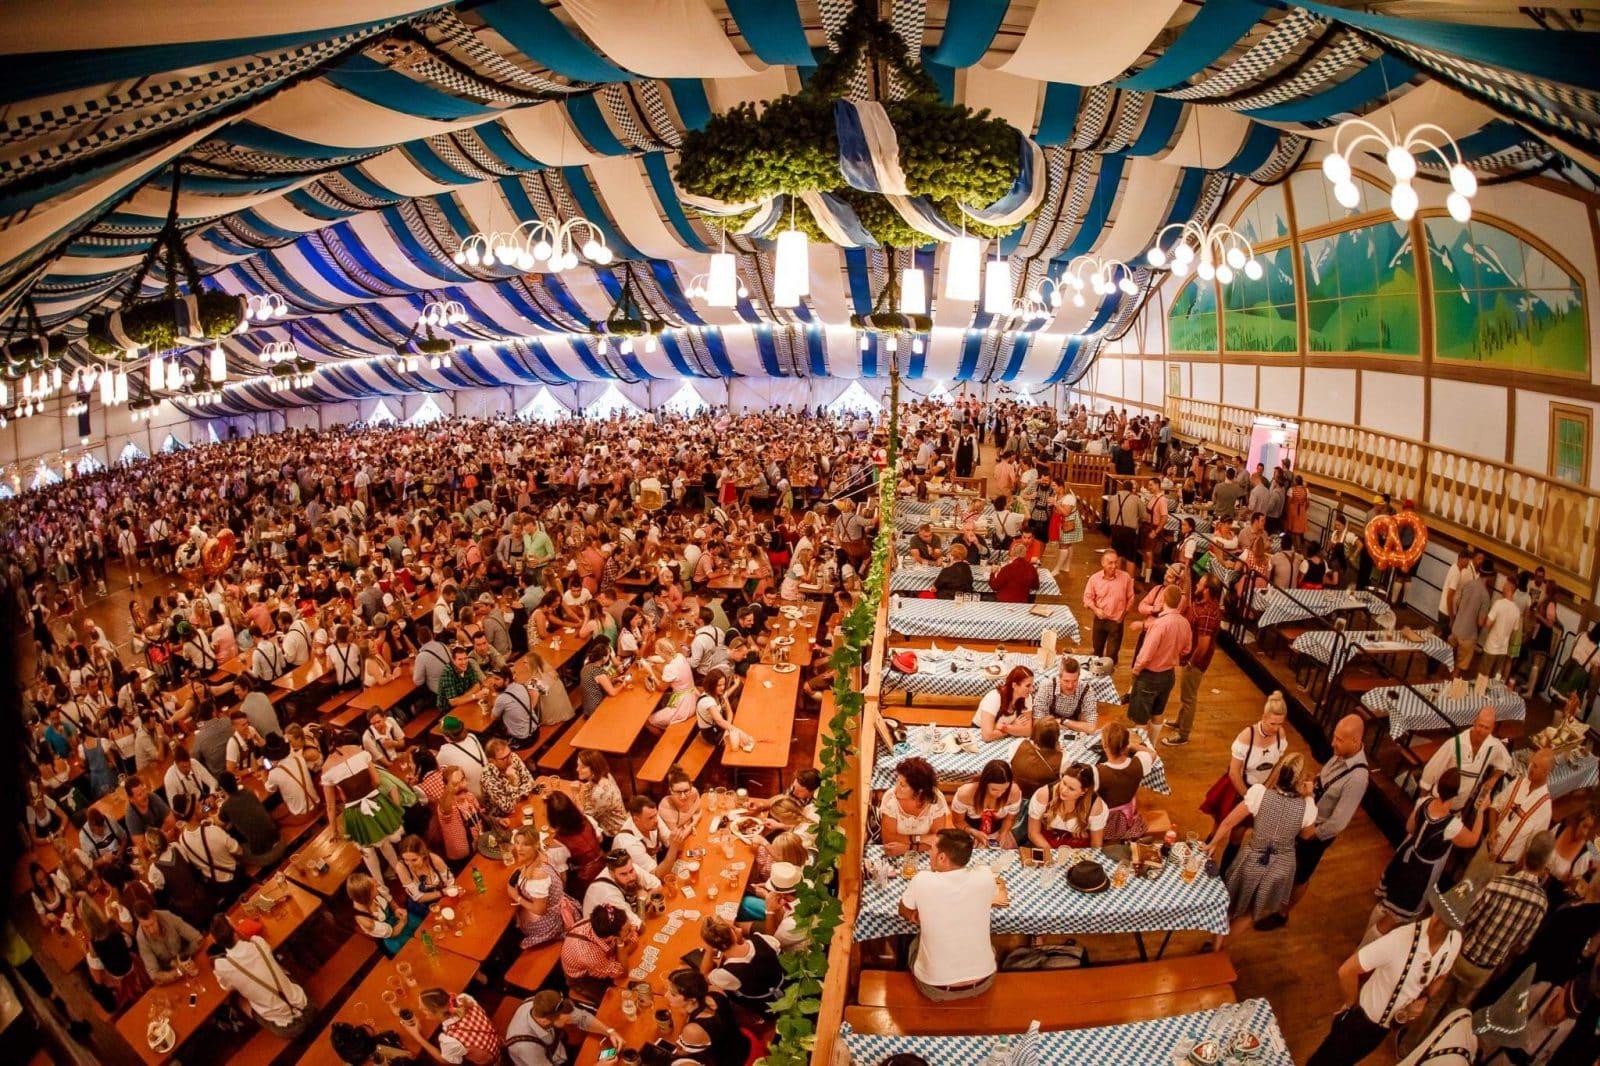 Top tips for attending Oktoberfest Brisbane with kids